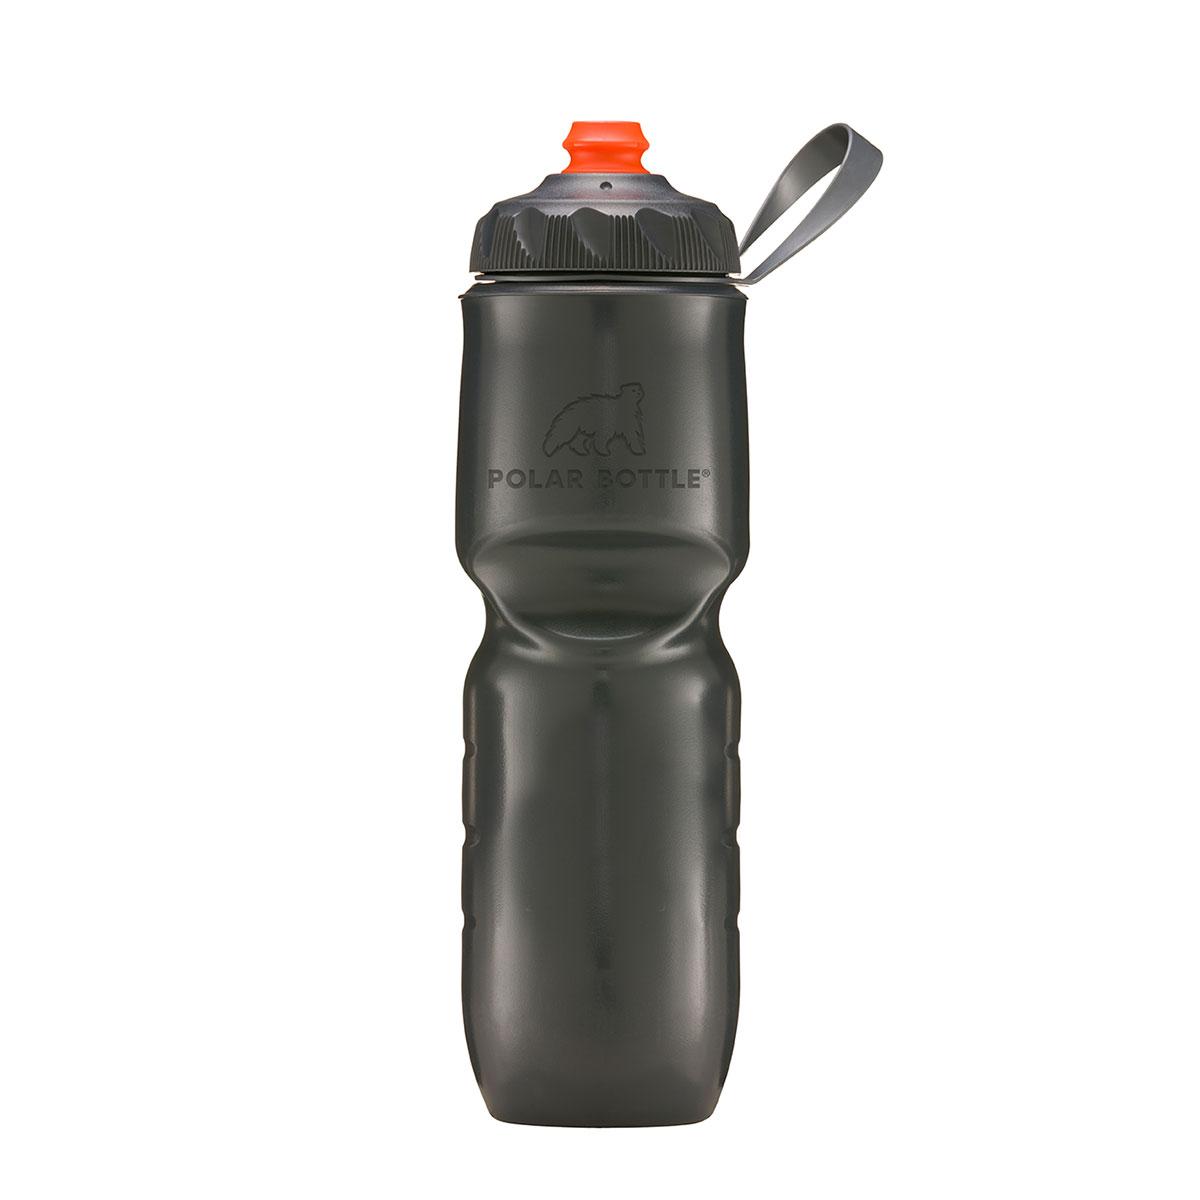 Polar Bottle Insulated Sport - $16.00, 20oz